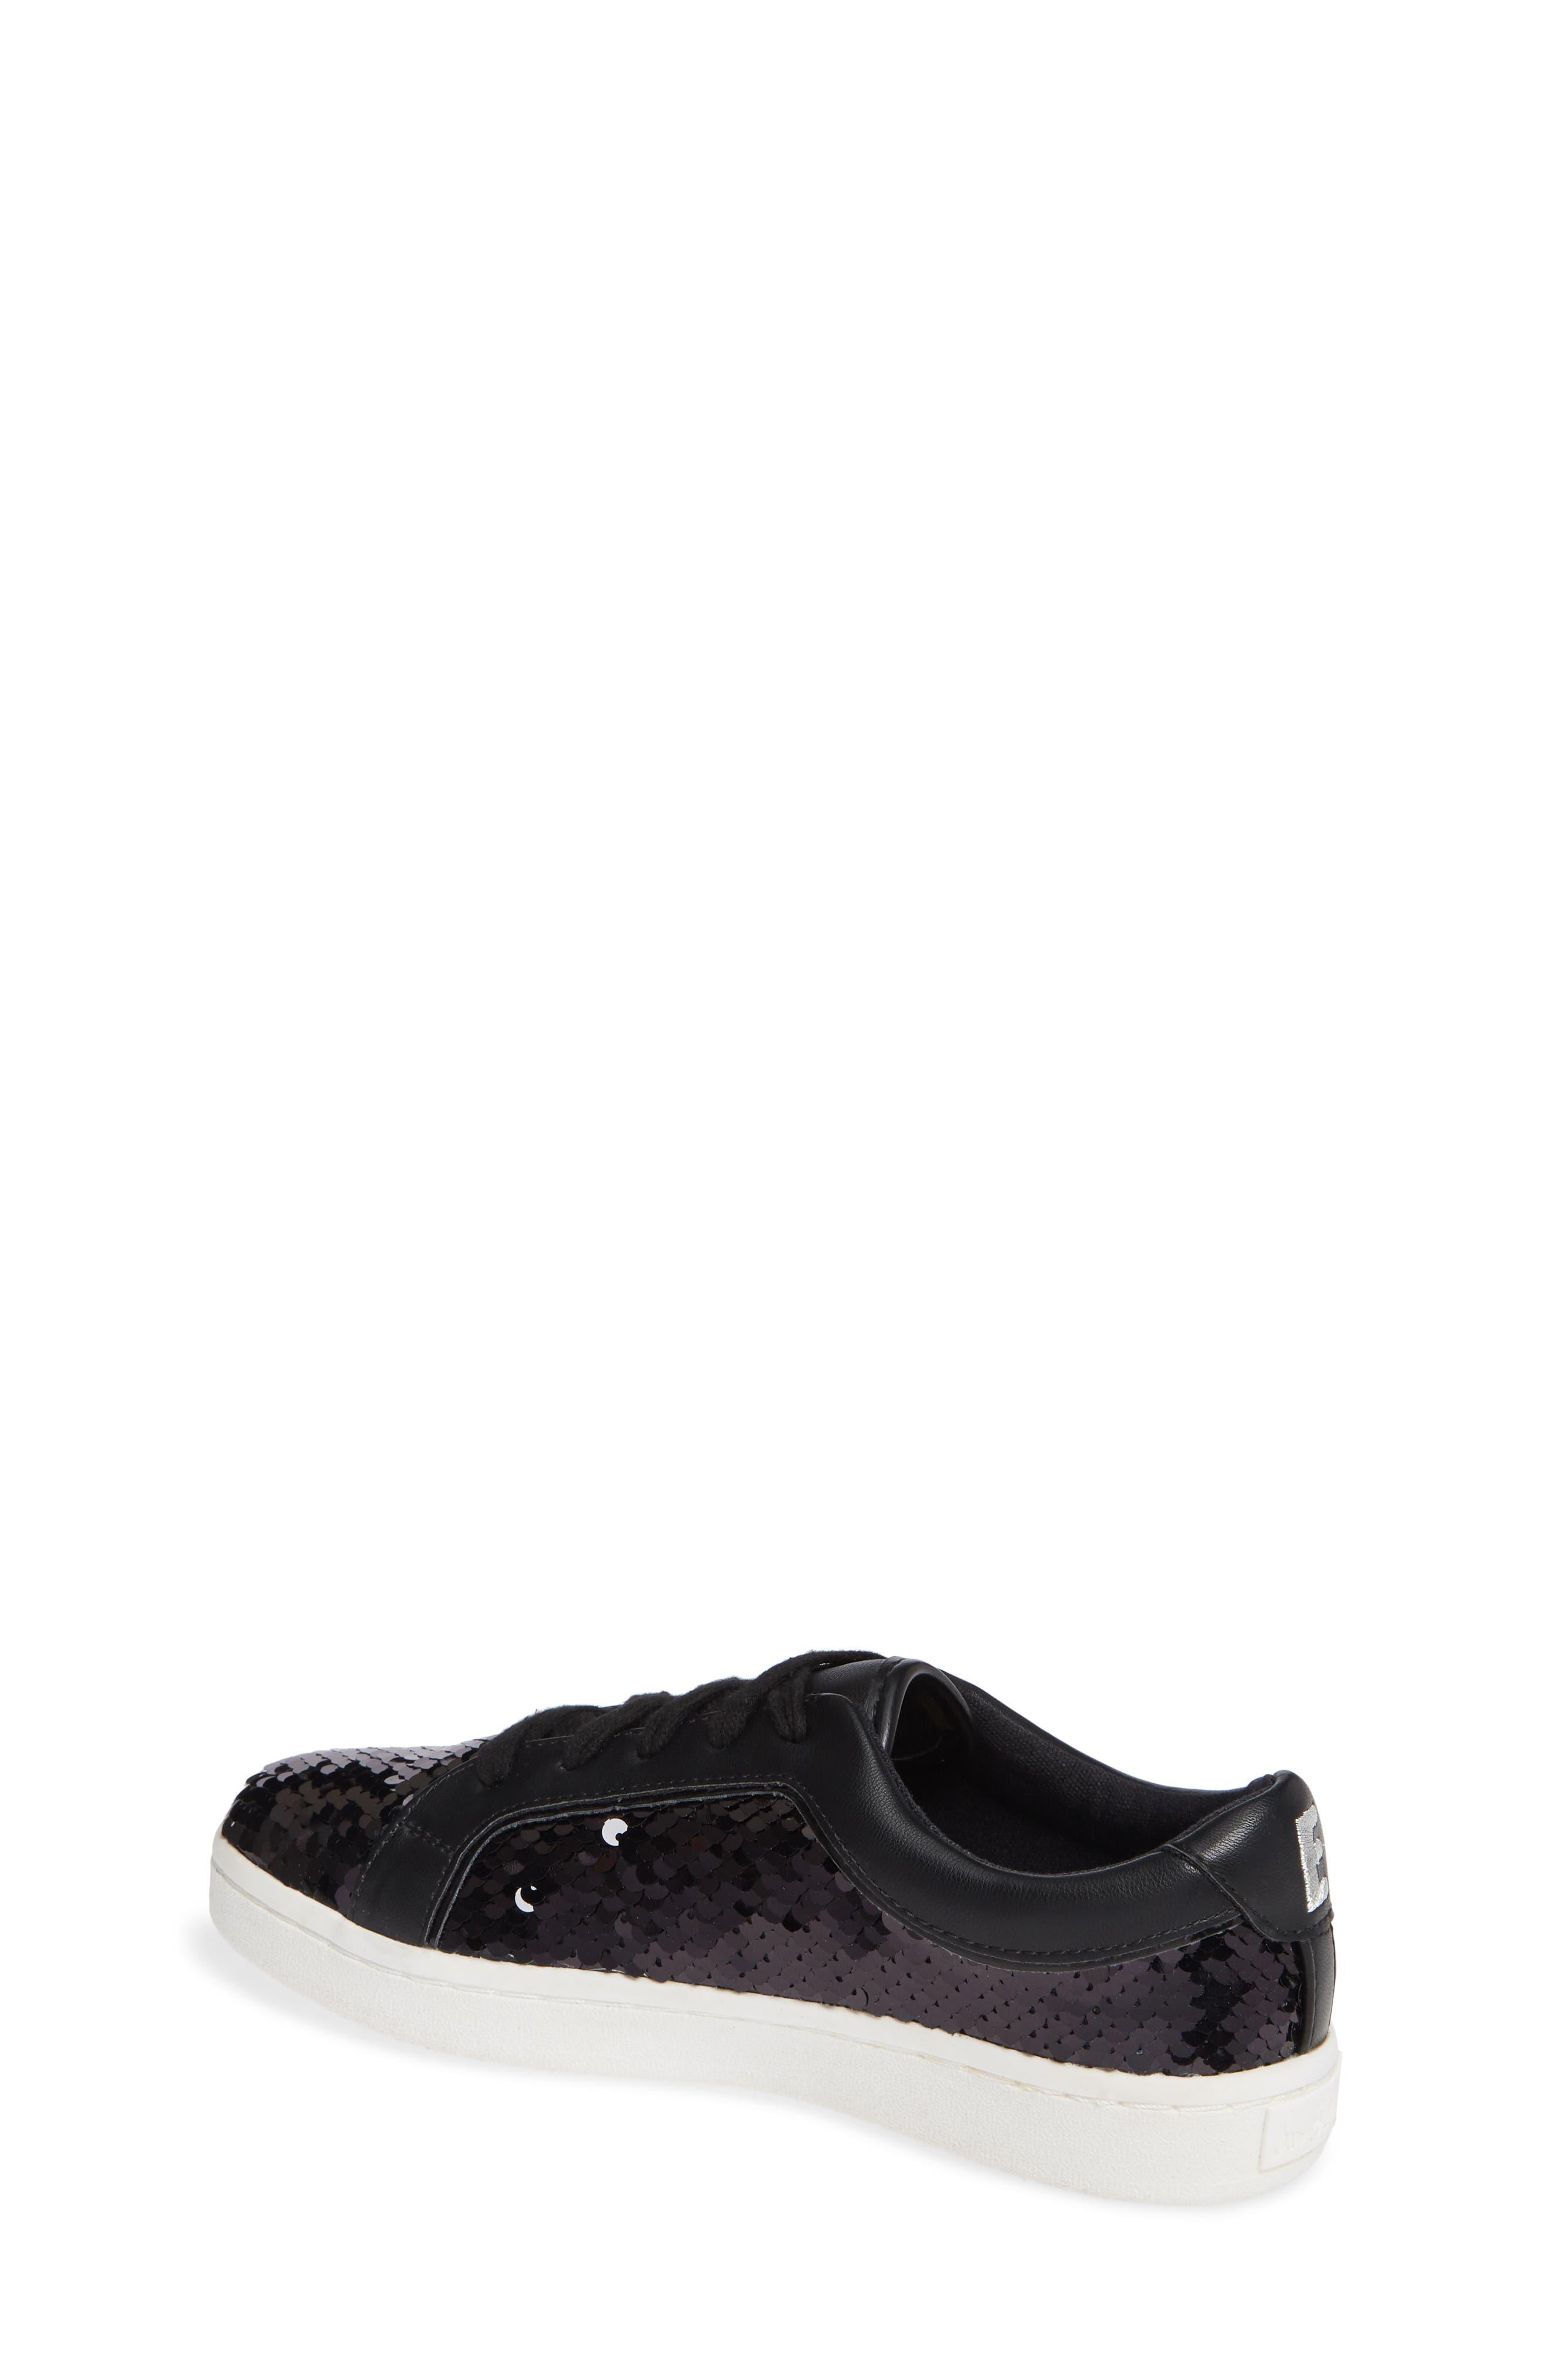 Blane Elizia Sequin Sneaker,                             Alternate thumbnail 2, color,                             BLACK SILVER